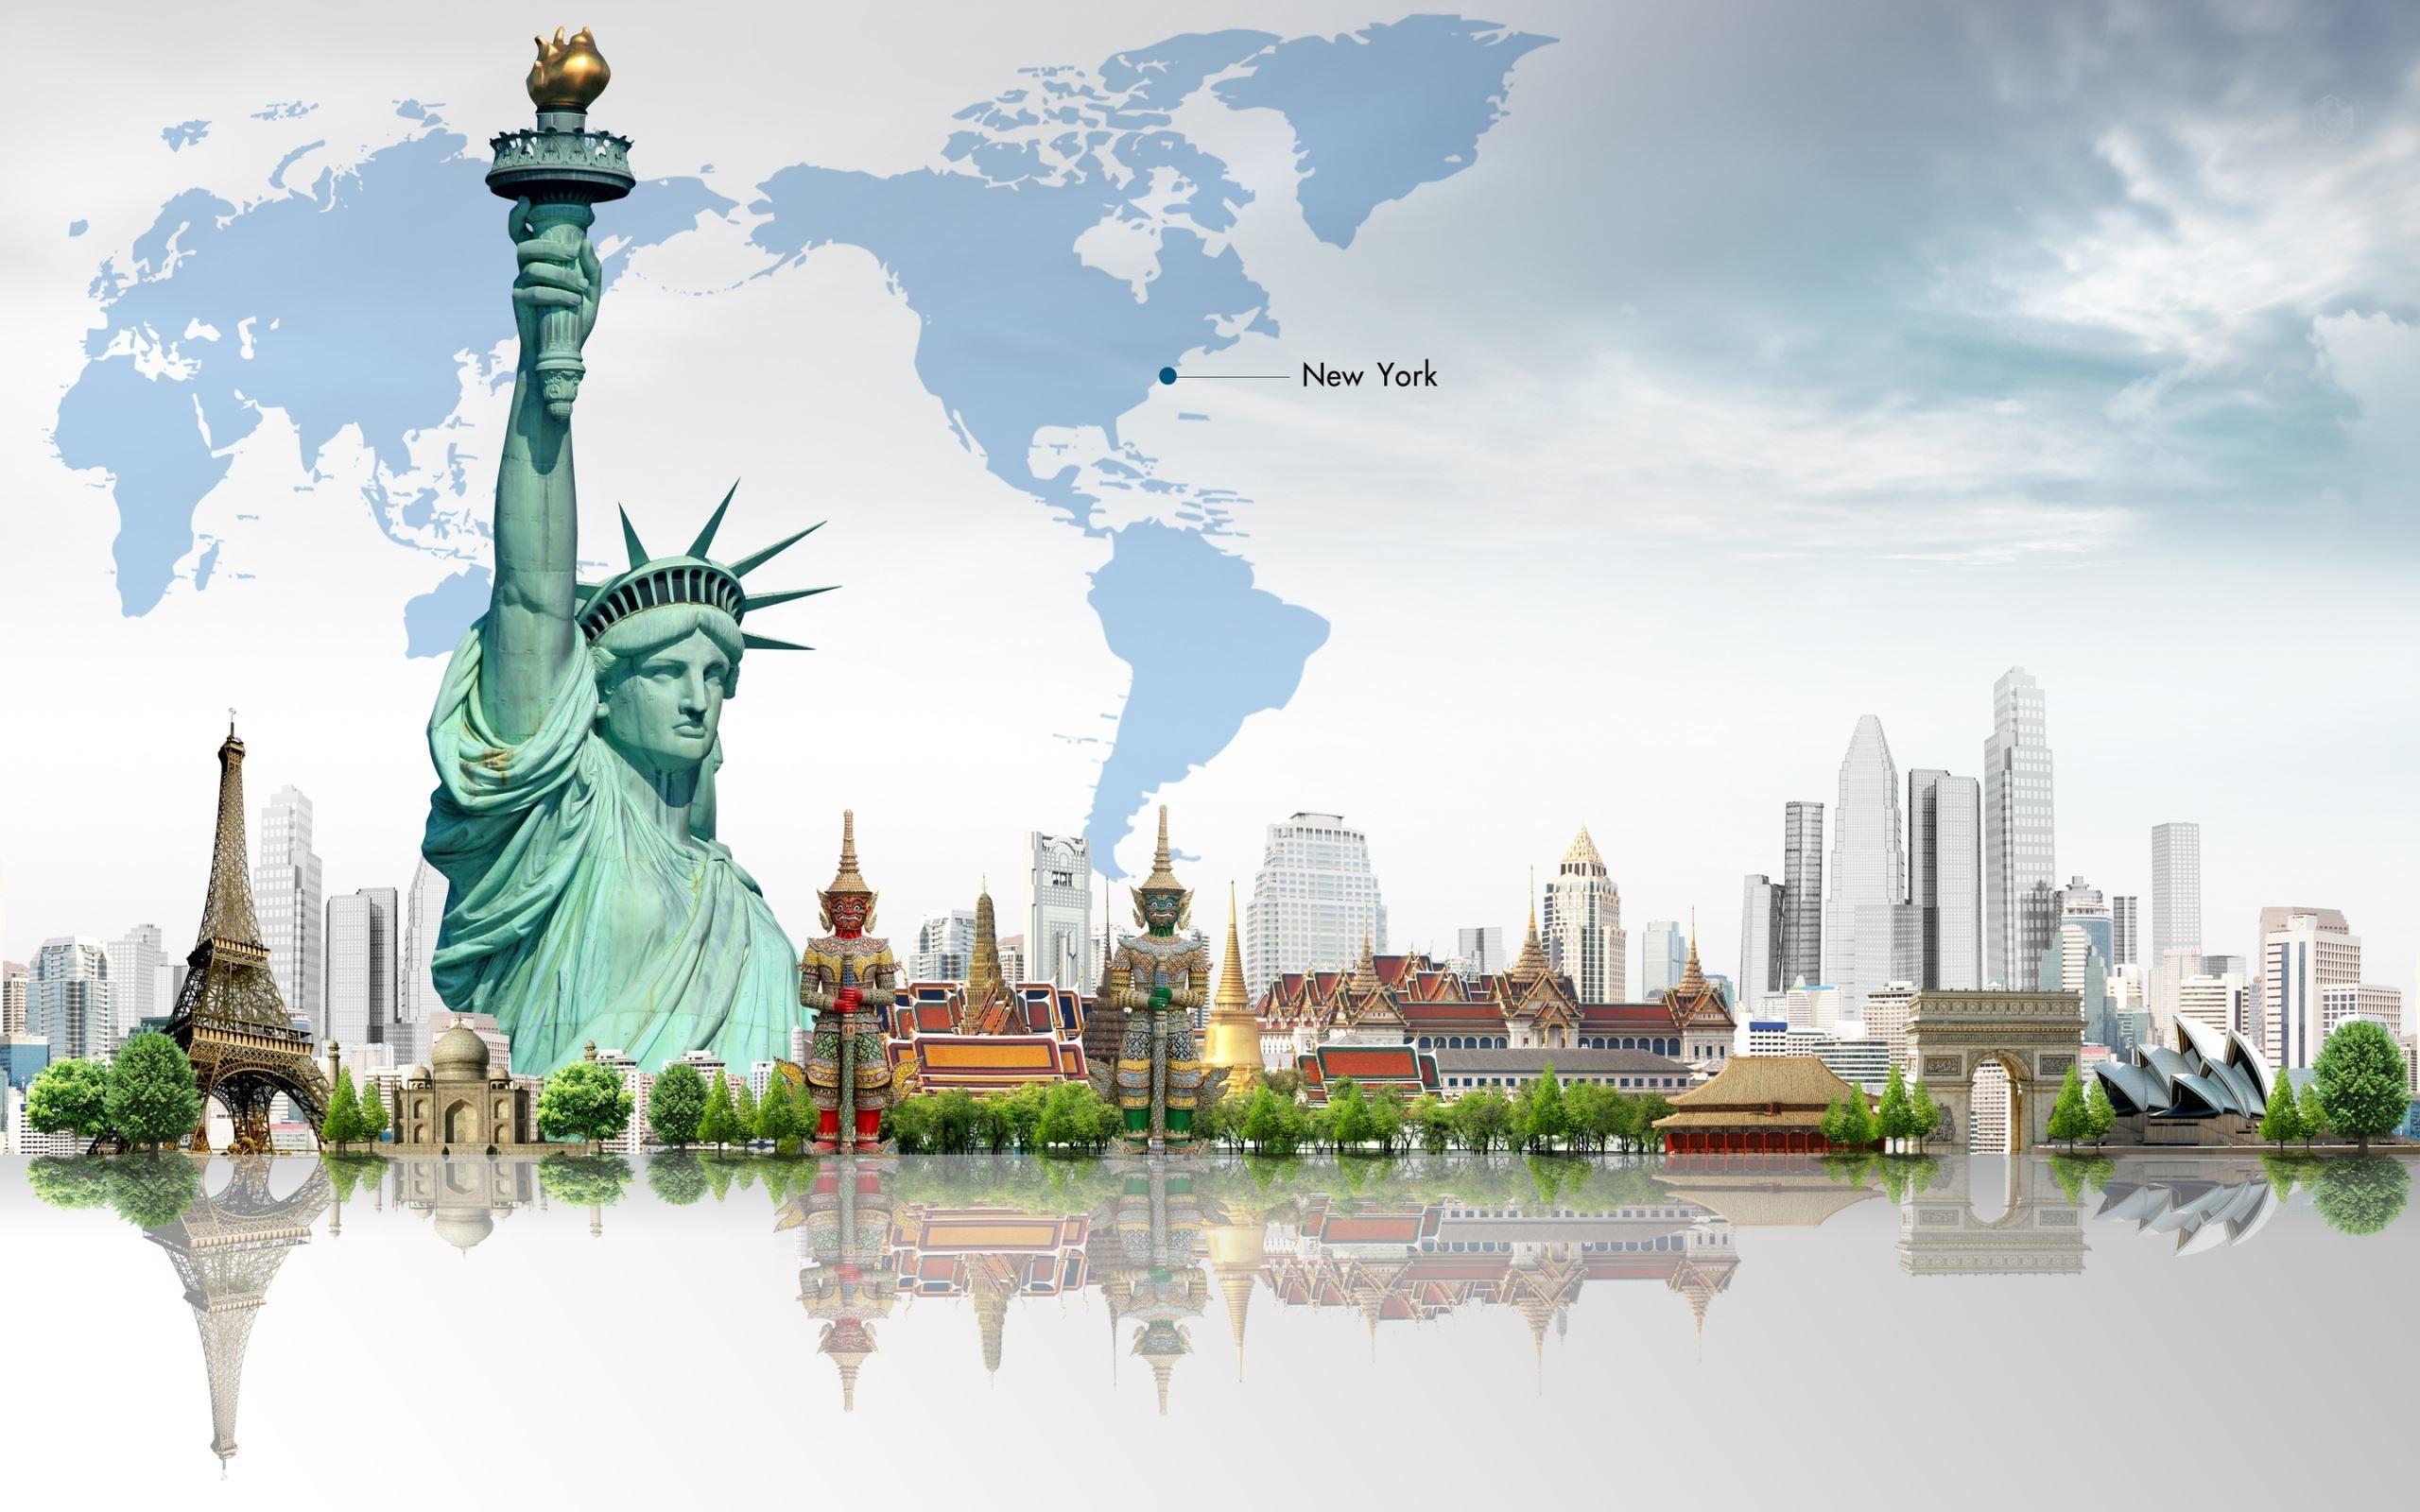 World Travel Wallpaper 2014 HD